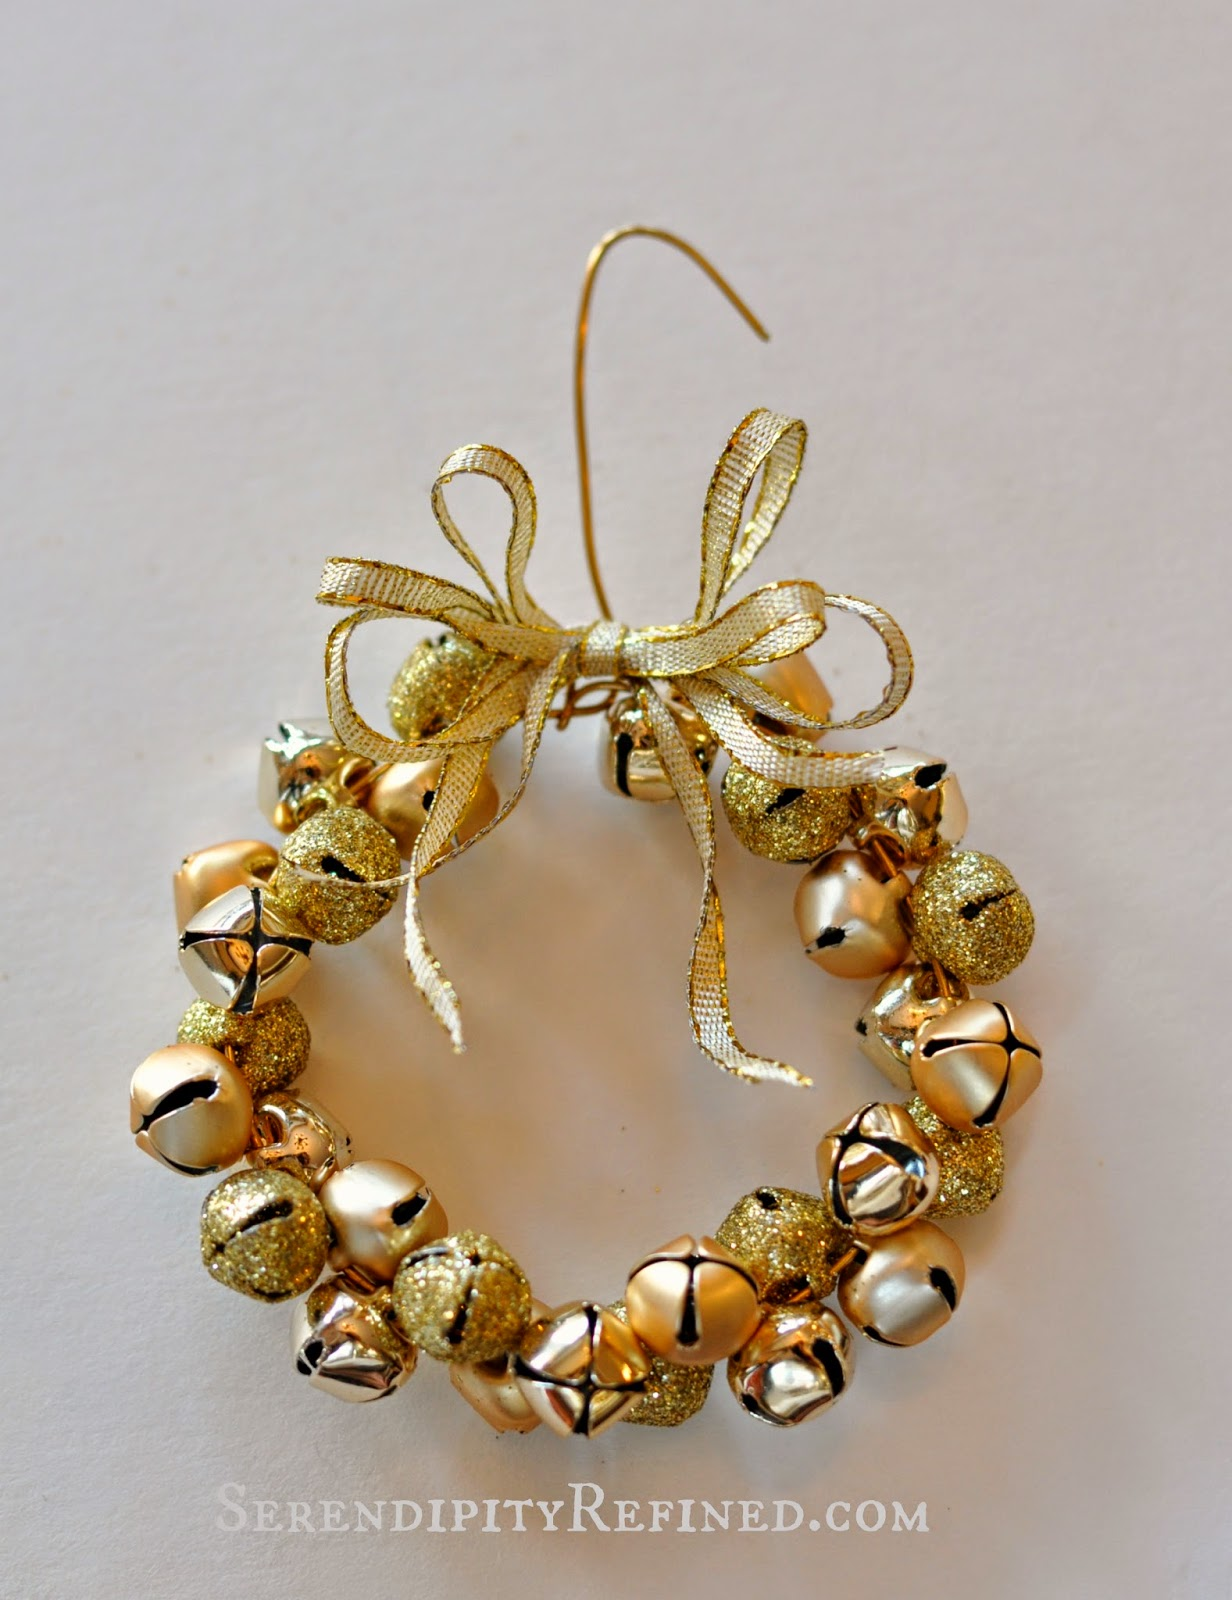 Jingle bell ornaments - Directions